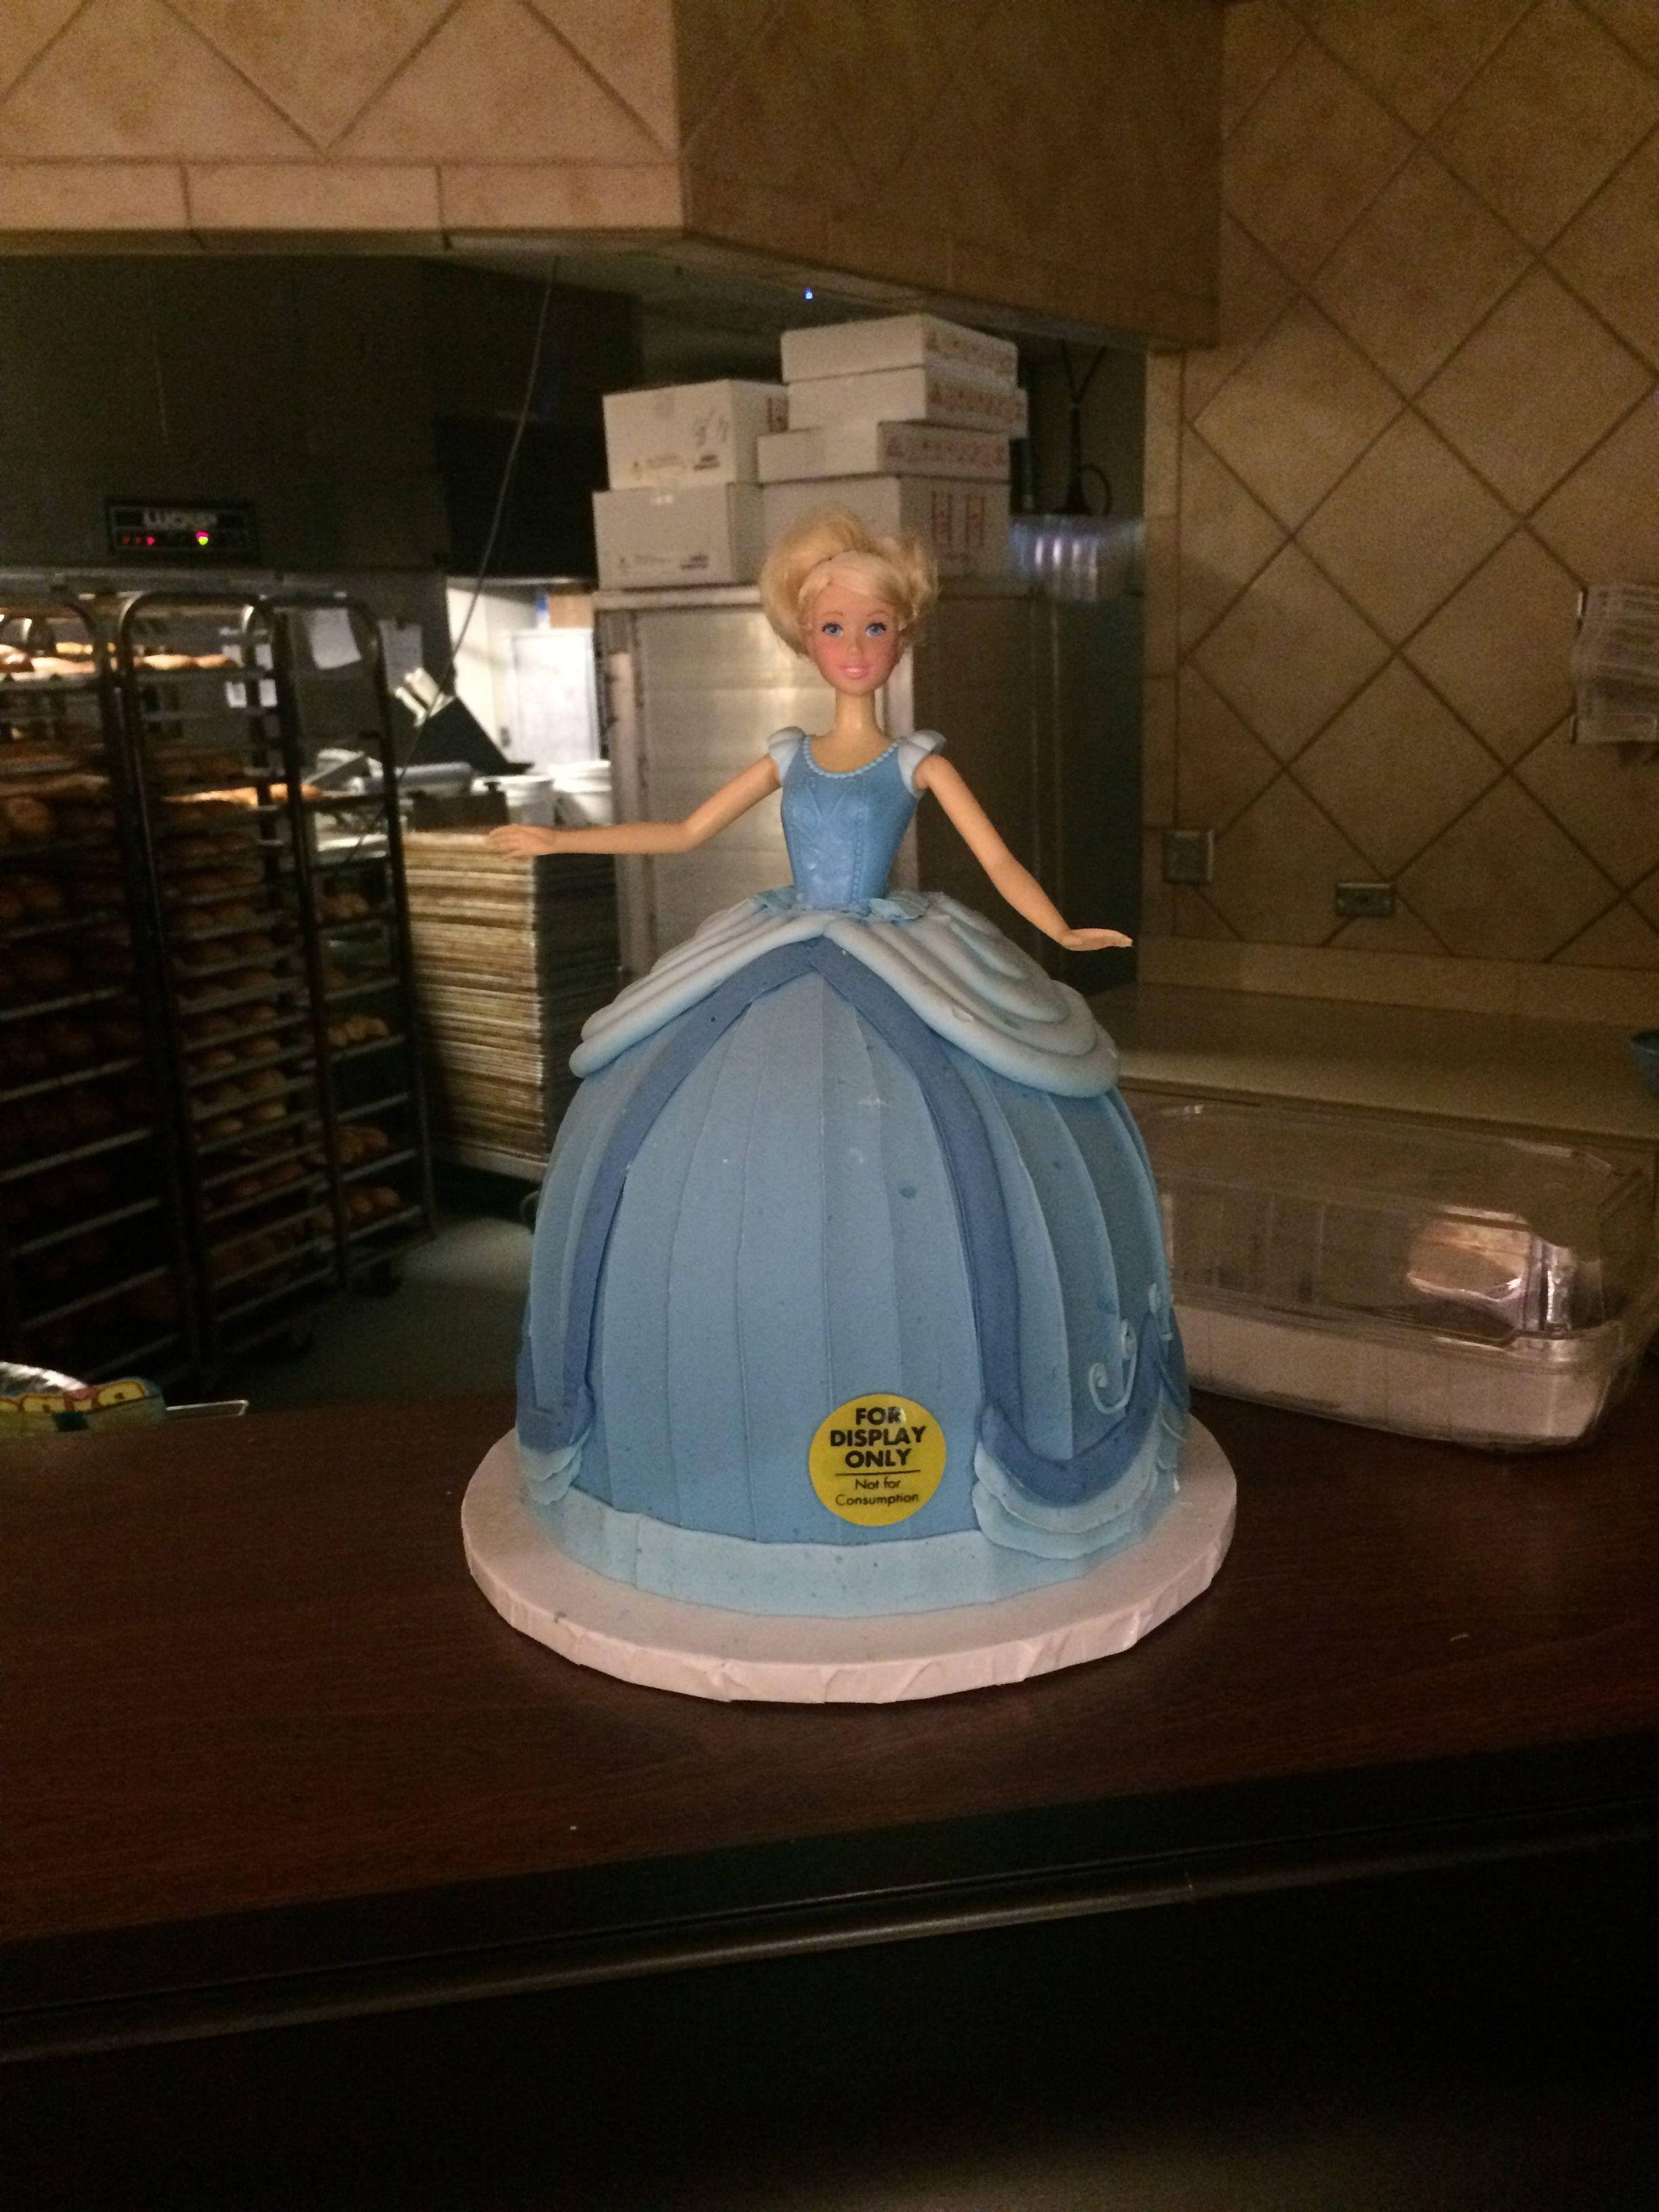 Brilliant Cinderella Barbie Cake At Safeway Barbie Birthday Cake Barbie Personalised Birthday Cards Paralily Jamesorg